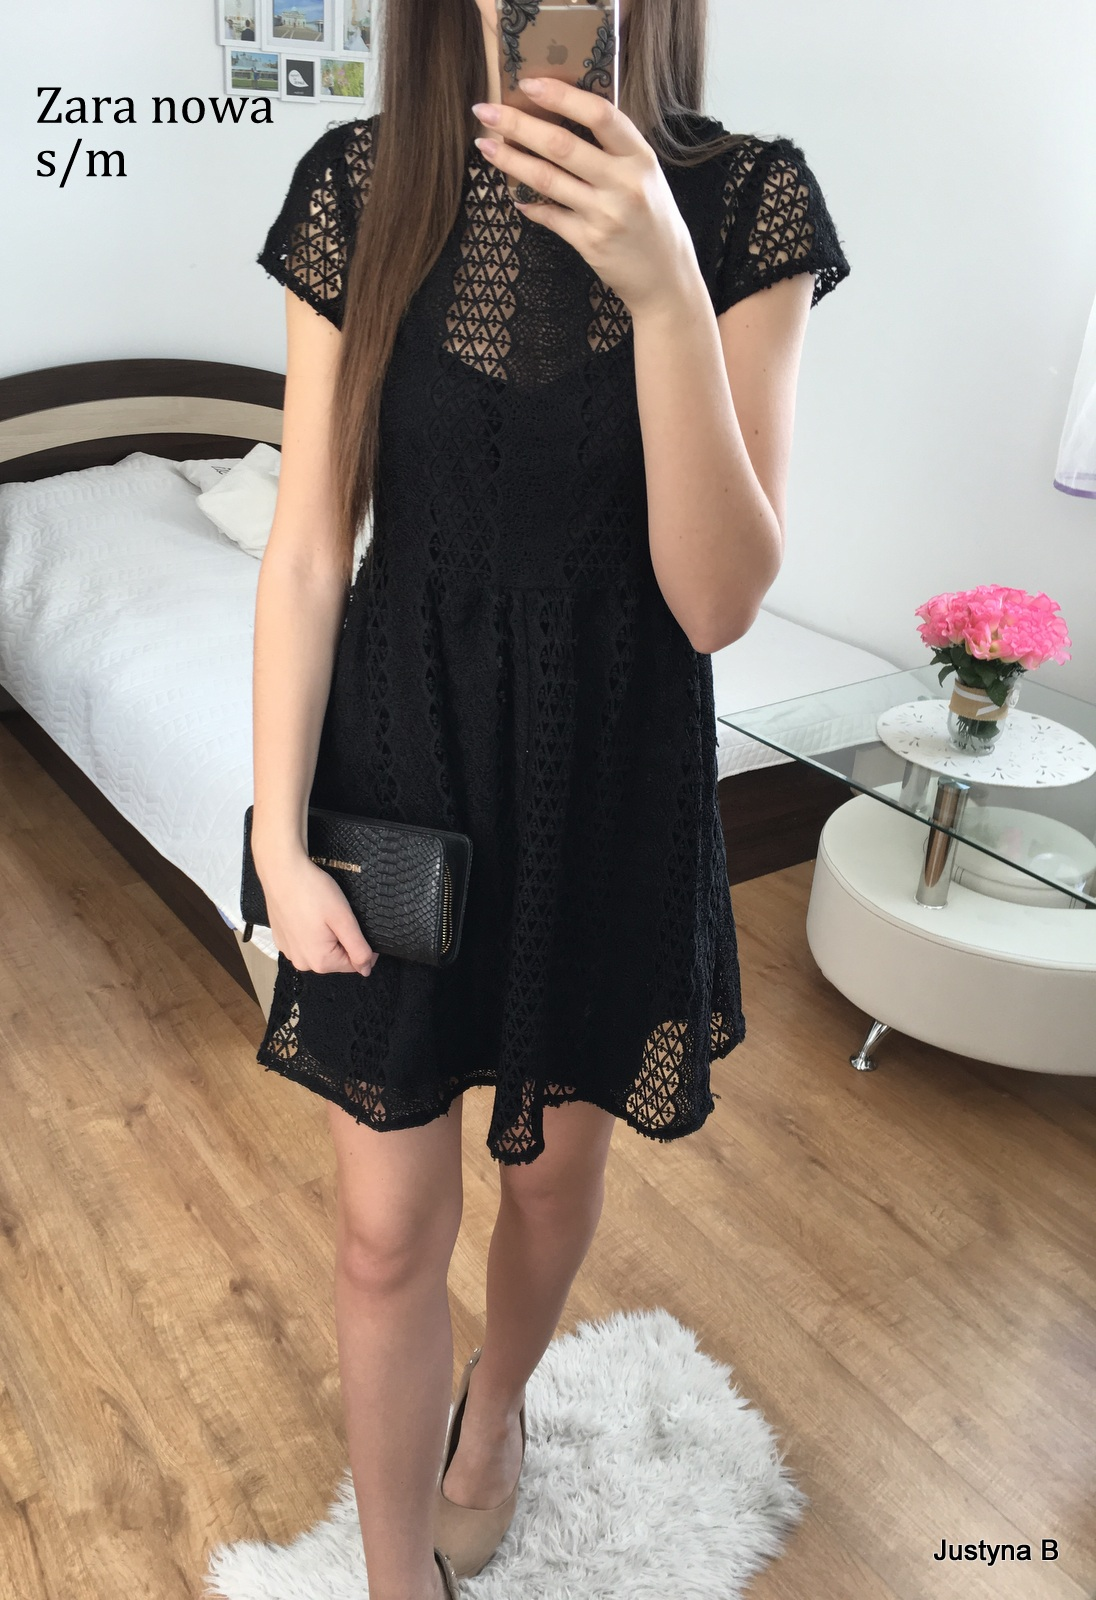 e210ad27172128 Zara czarna sukienka koronka rozkloszowana S m - 7234483424 ...